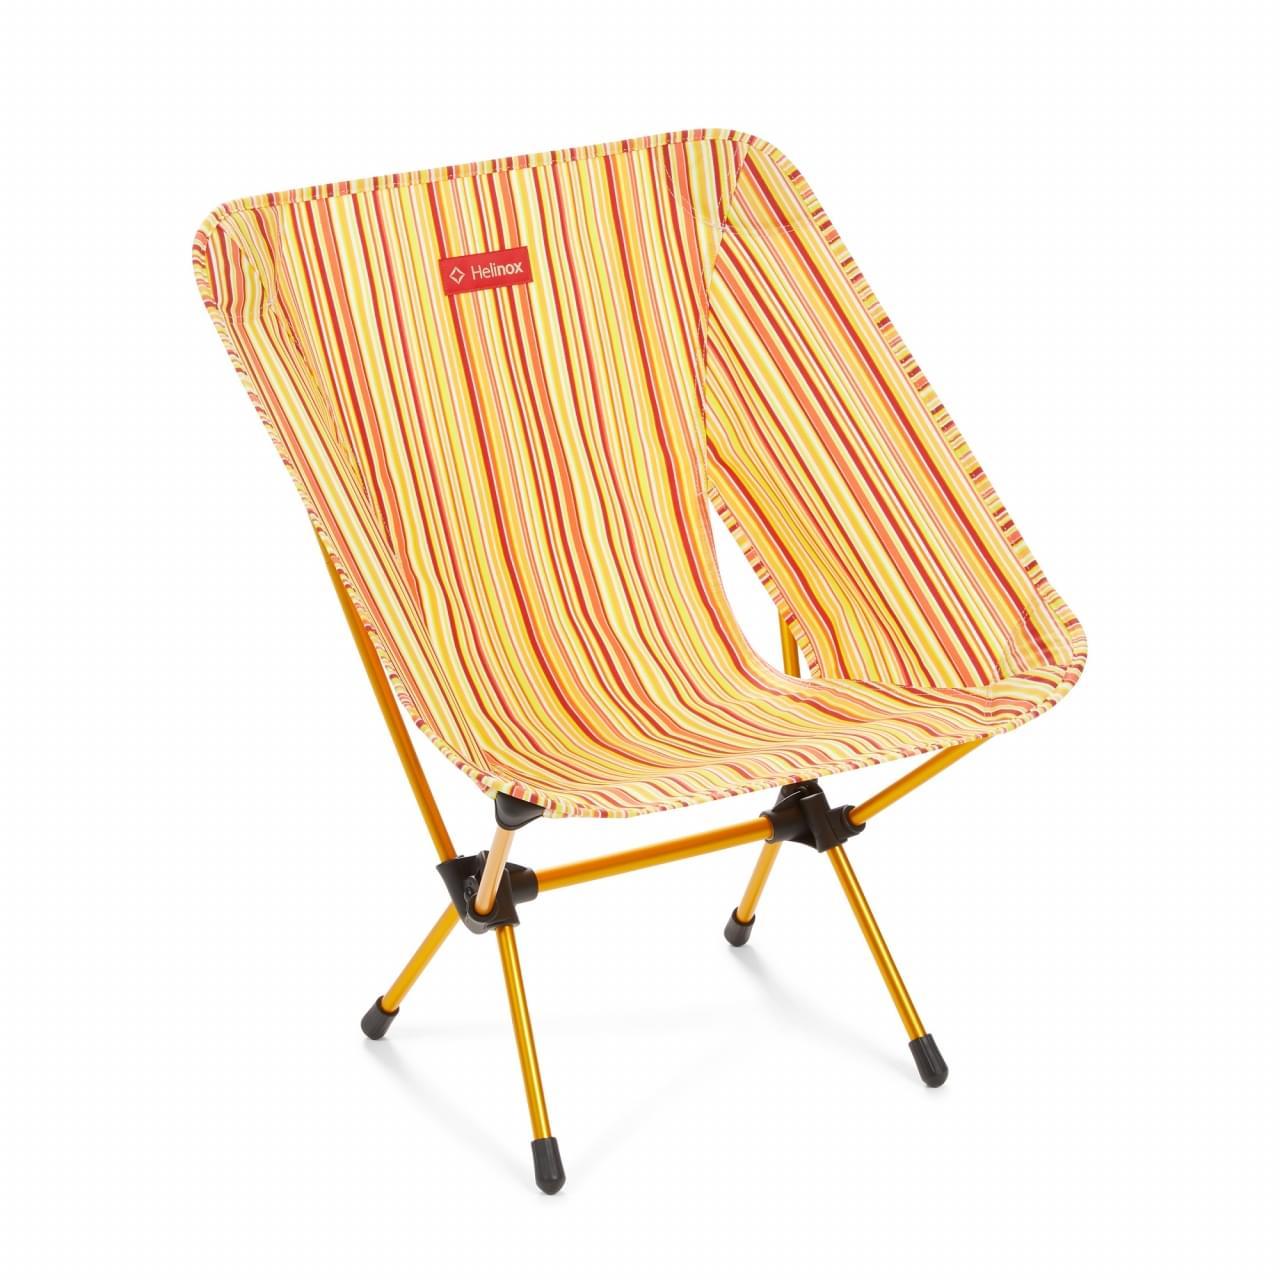 Helinox Chair One Stripe Lichtgewicht Stoel - Rood